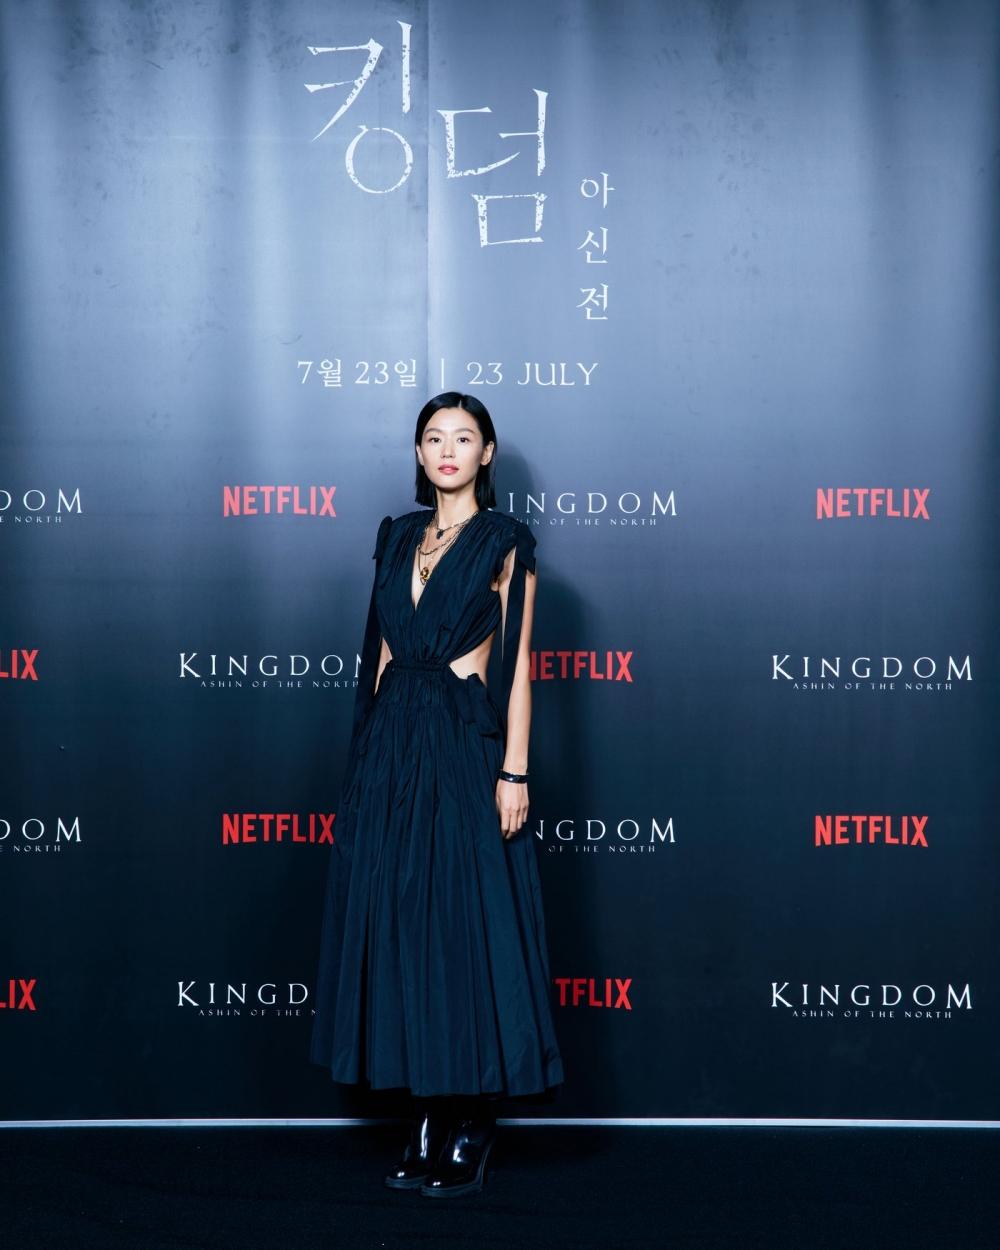 buổi ra mắt phim kingdom phần 3